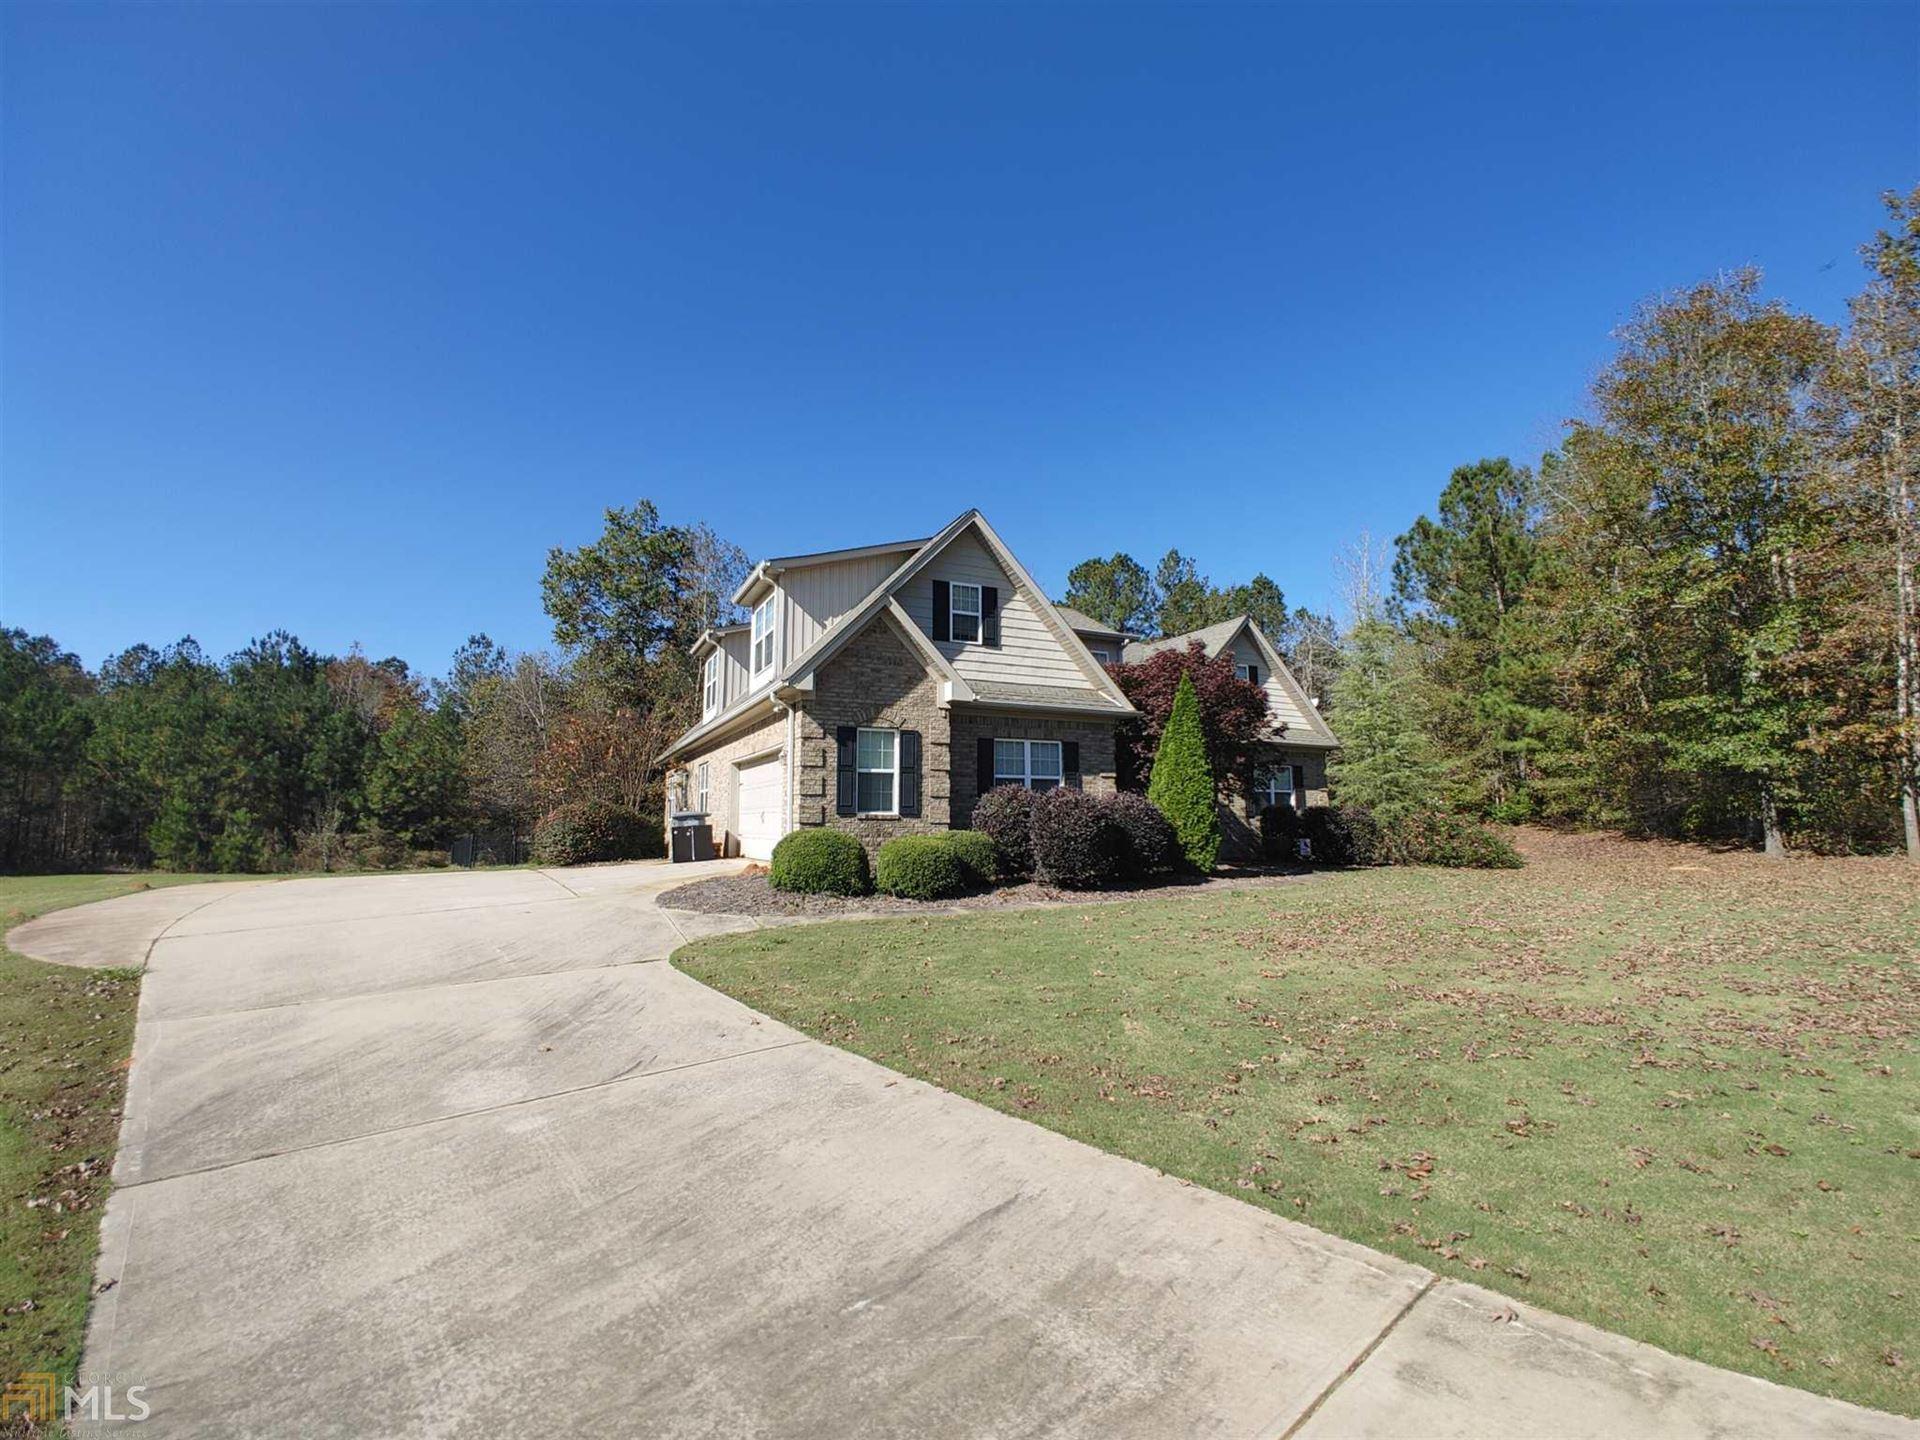 169 Magnolia Farms Dr, Milner, GA 30257 - #: 8887778